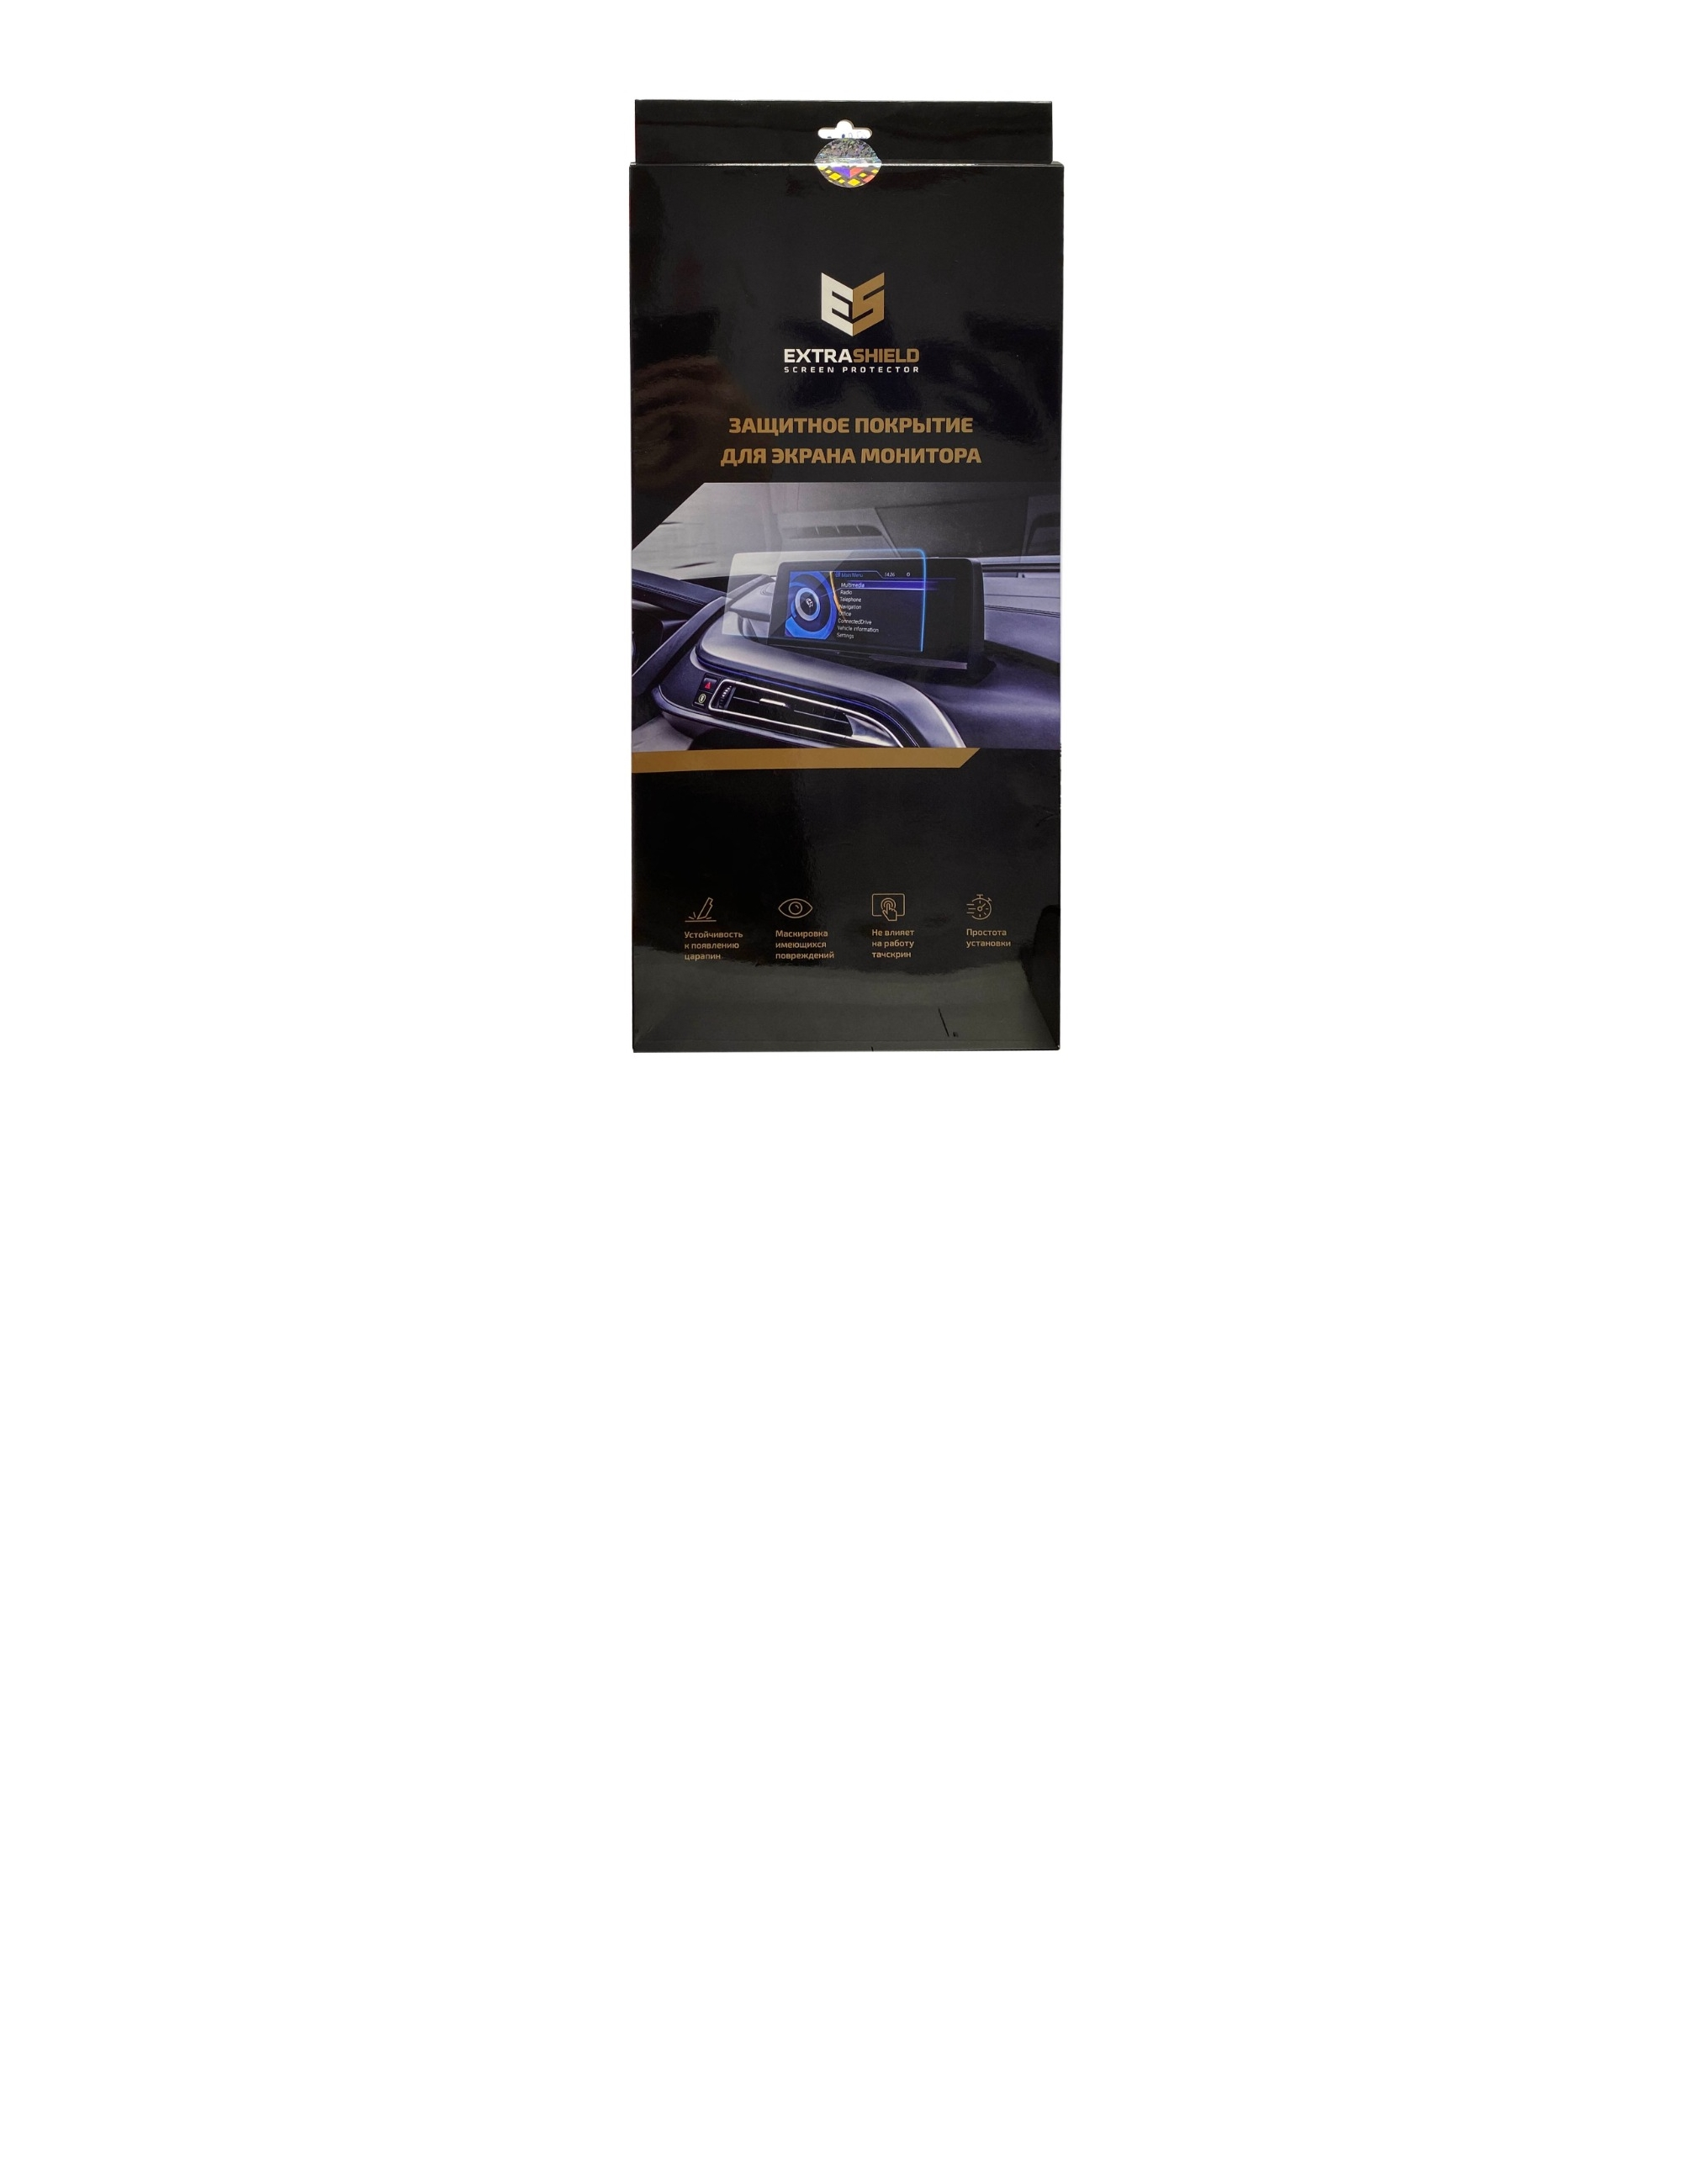 Infiniti Q50 Sedan/ Q60 Coupe 2016 - н.в. мультимедиа (верхниз) 7-8 Защитное стекло Глянец